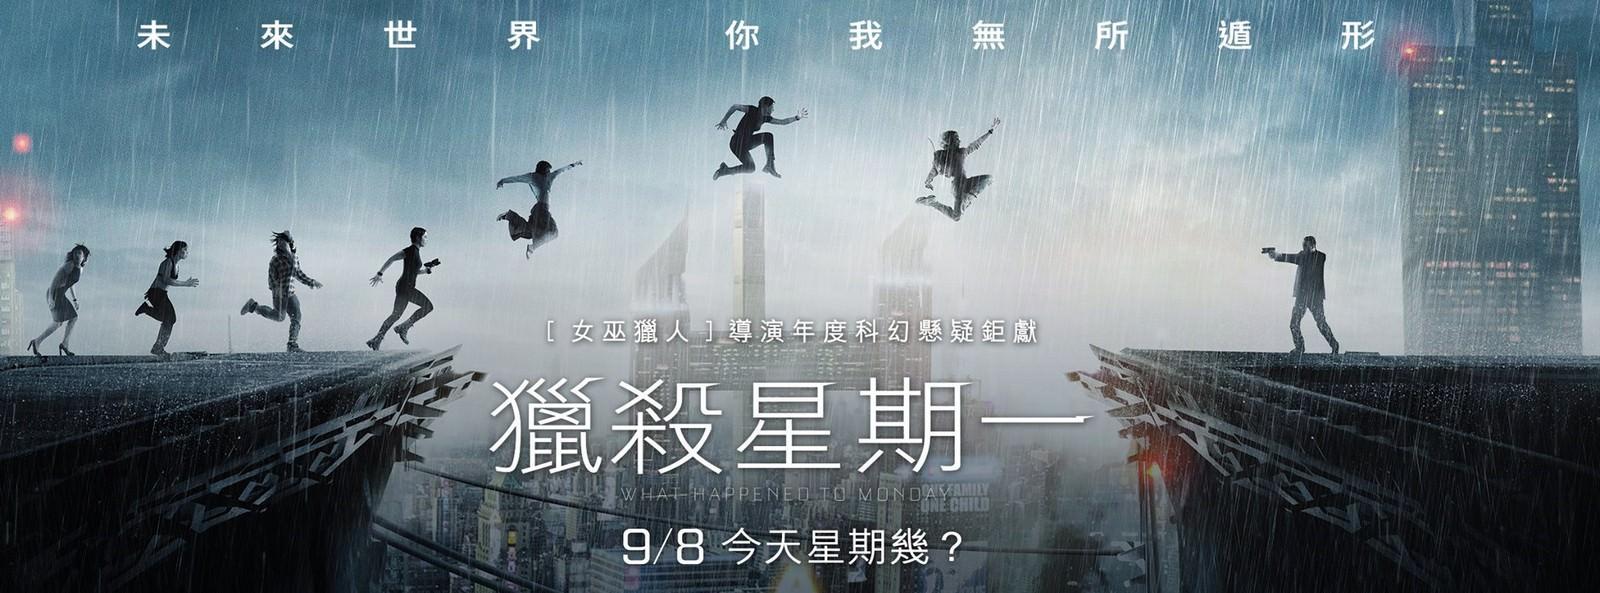 Movie, What Happened to Monday(英國, 2017年) / 獵殺星期一(台灣.香港), 電影海報, 台灣, 橫版(非正式)